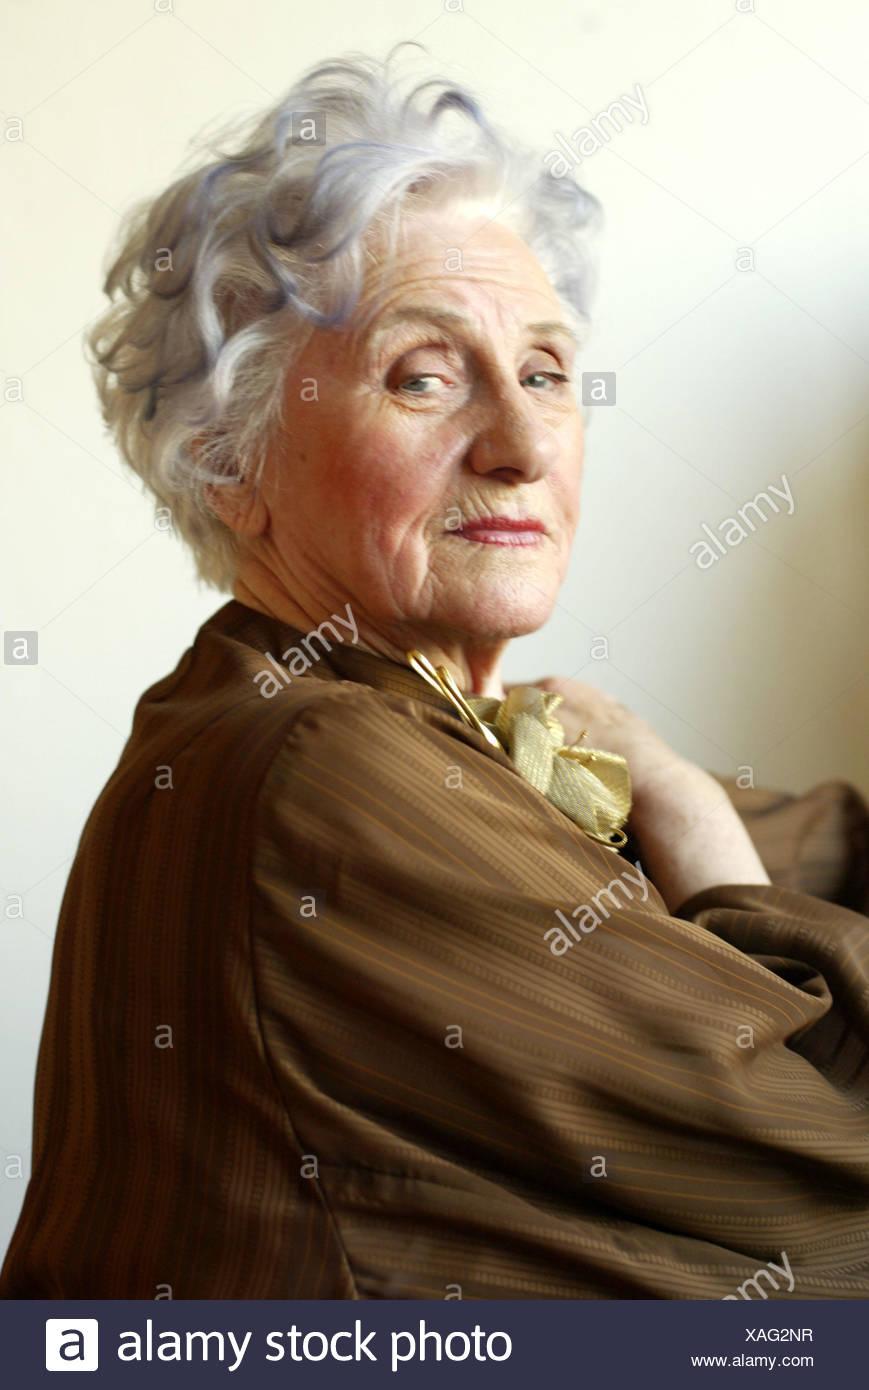 Senior Elegantly Seriously Portrait 60 70 Years Woman